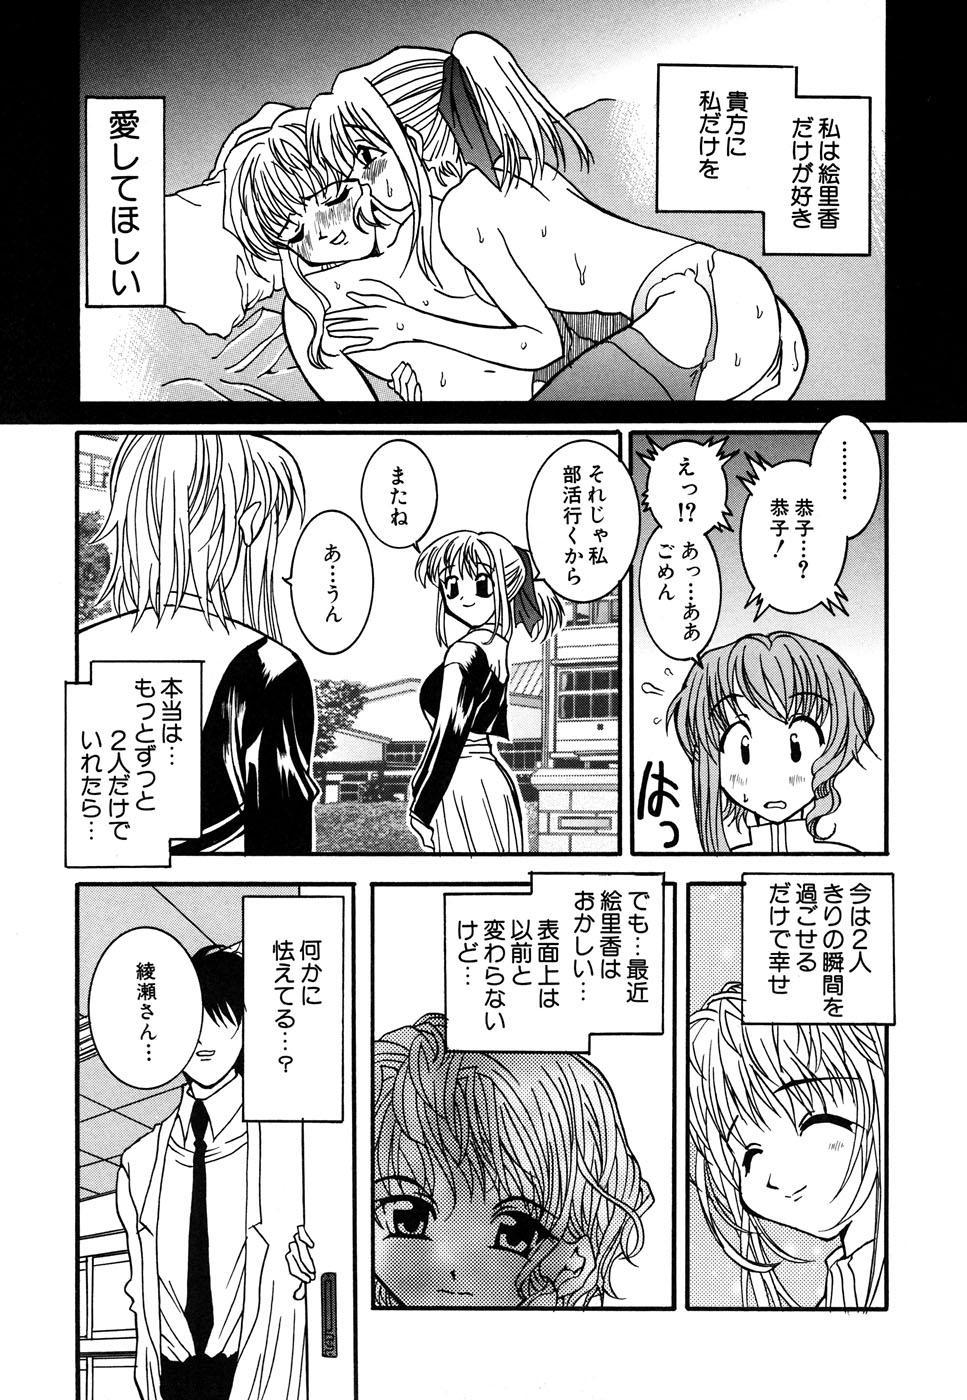 G-drive Vol.1 Ryoujokuhen 164